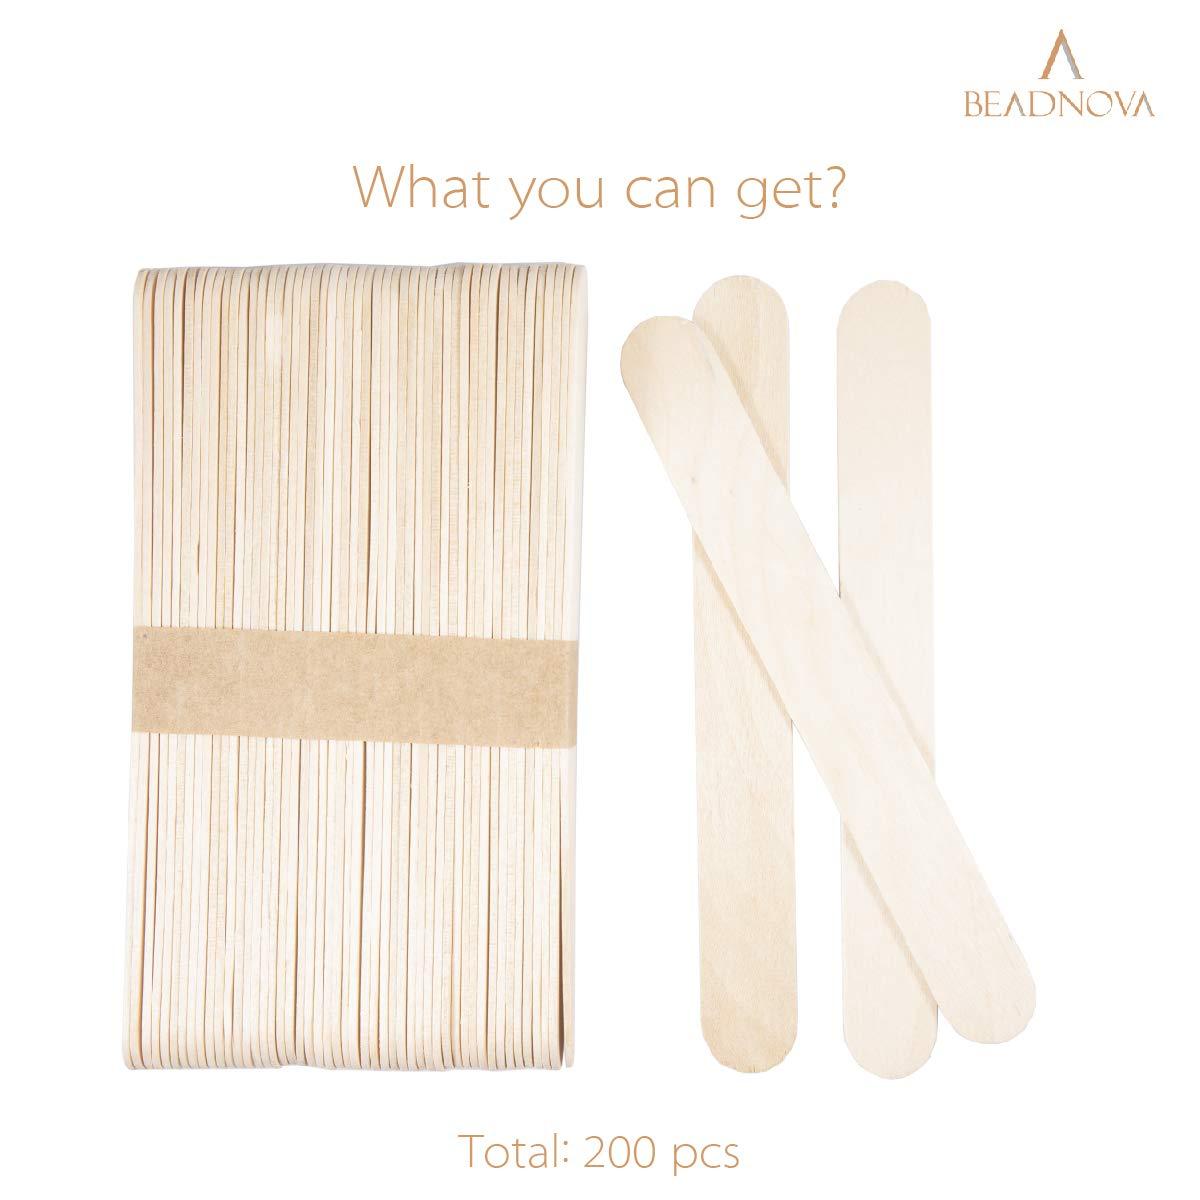 4.5 Inch, 200 Piece, Natural Color BEADNOVA Tongue Depressors Wood Sticks Craft Sticks Wooden Popsicle Sticks for Crafts